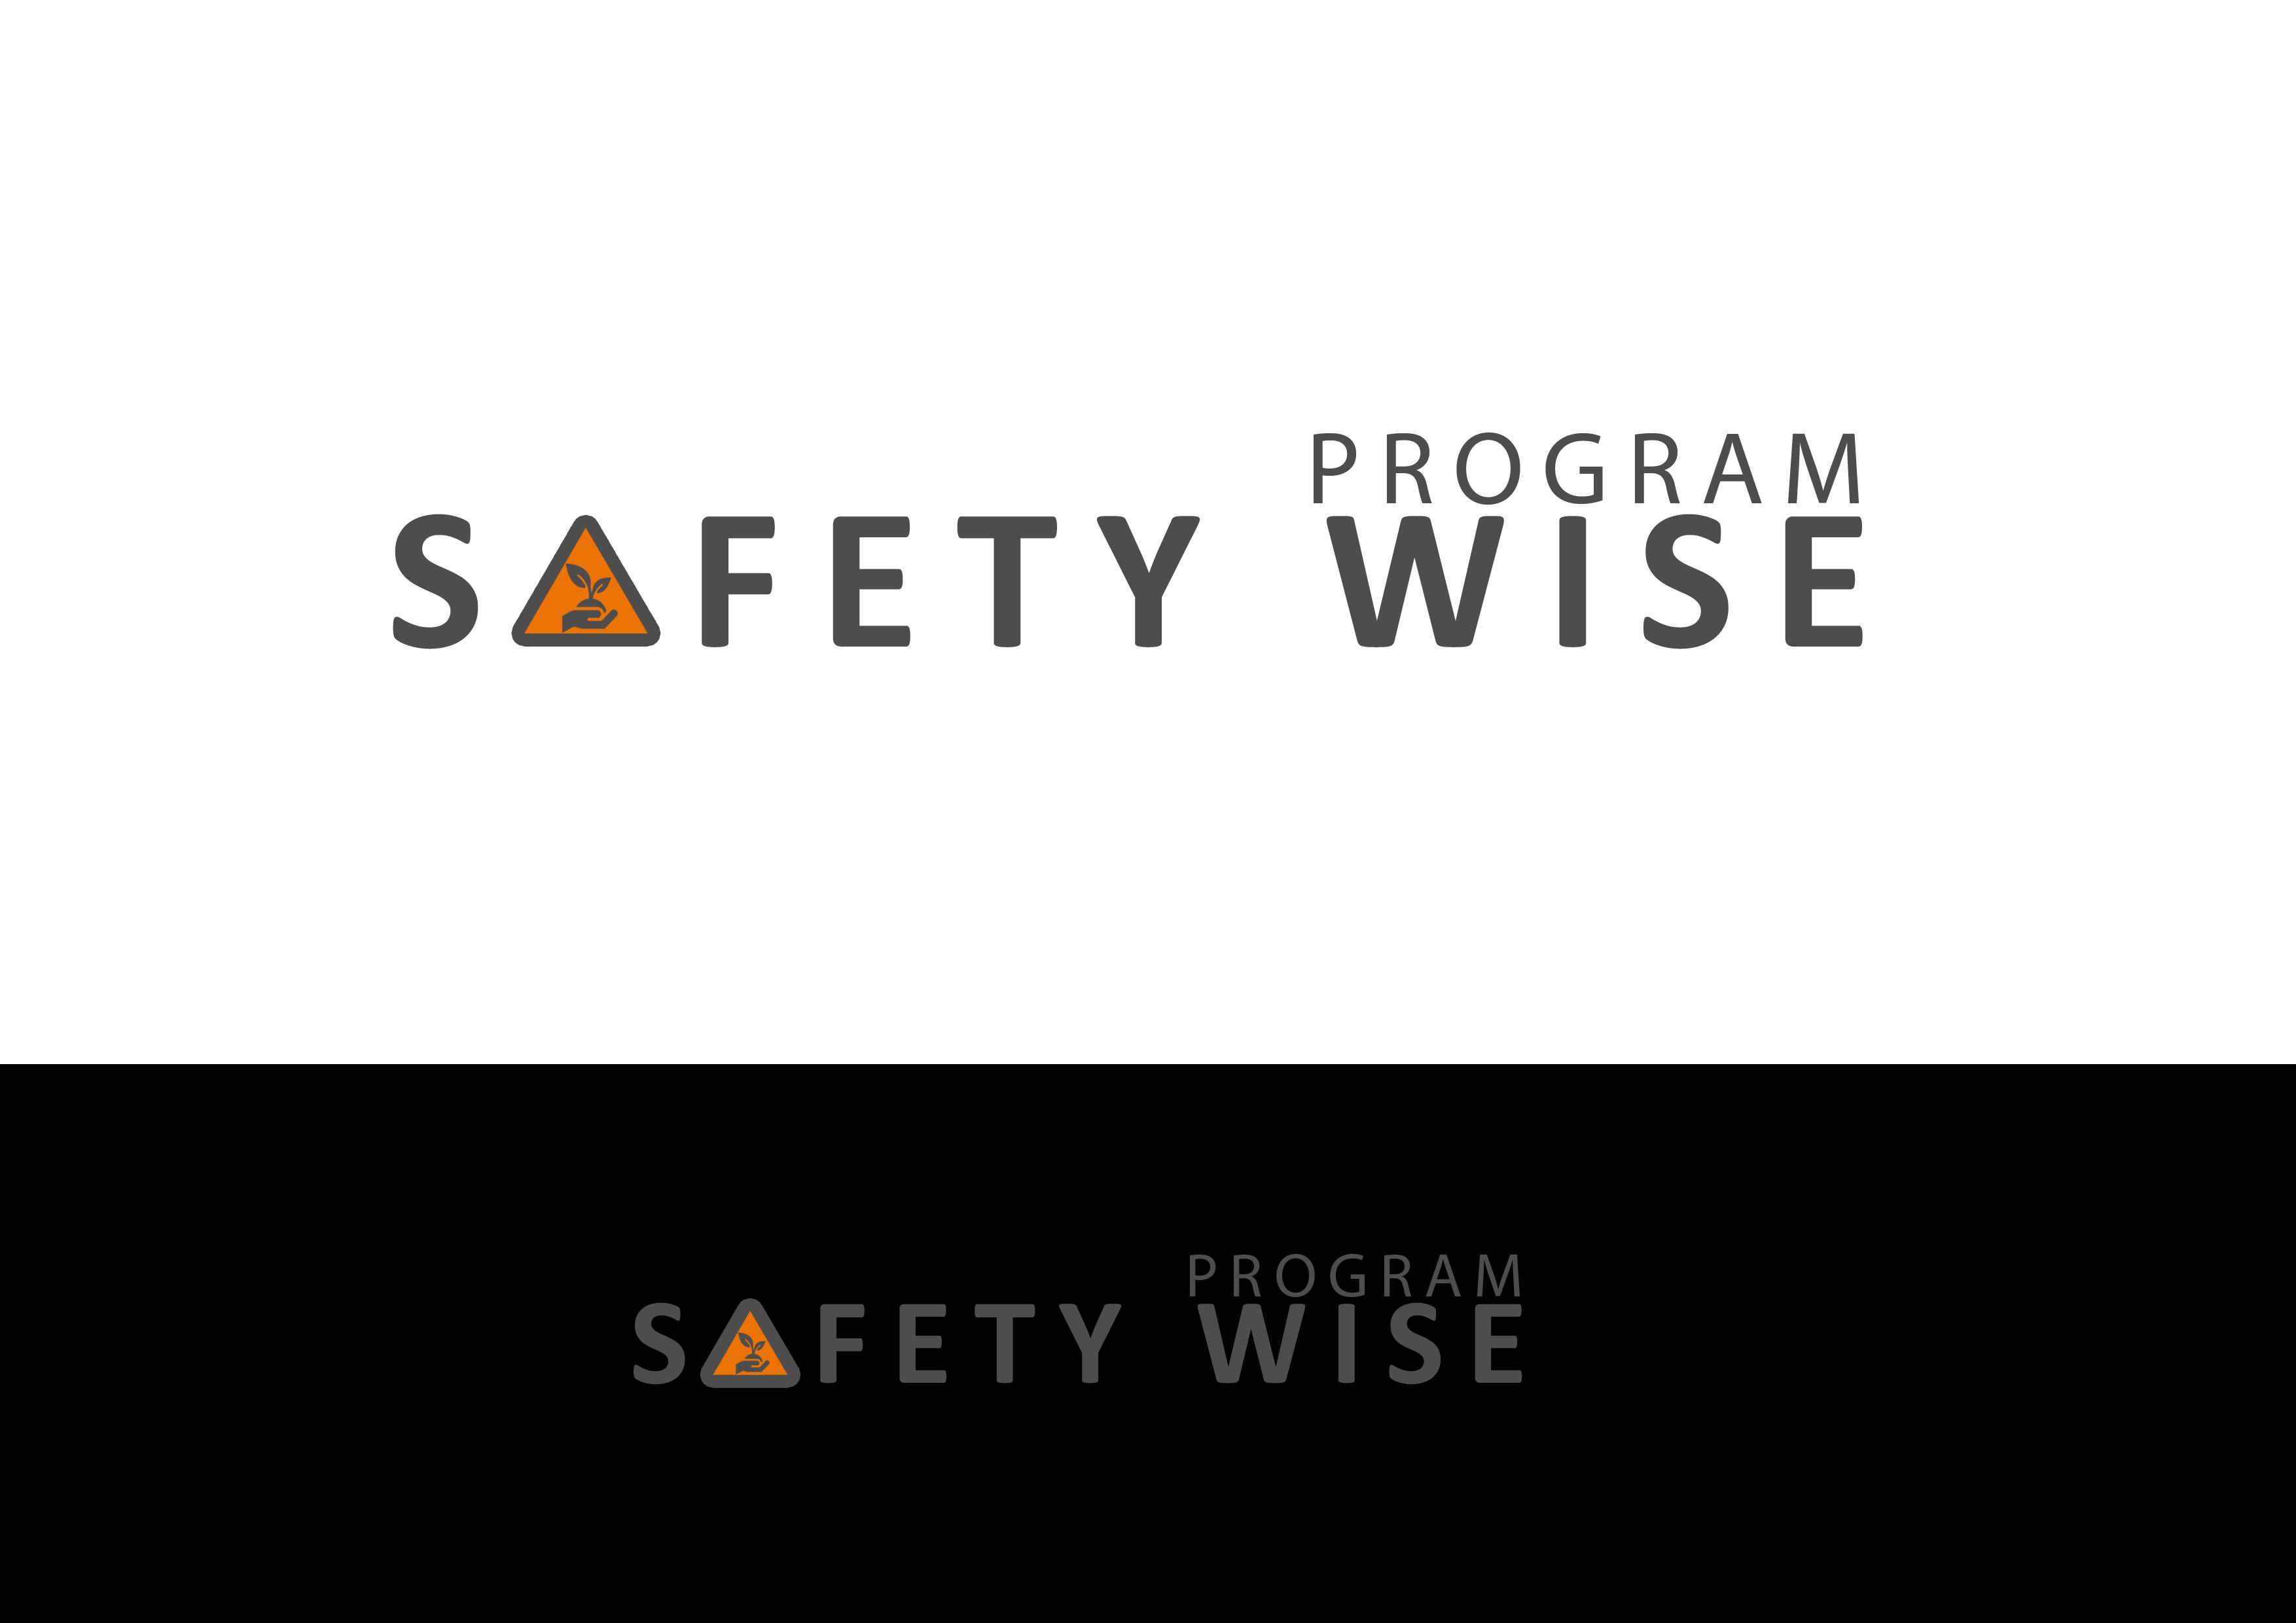 Logo Design by JSDESIGNGROUP - Entry No. 197 in the Logo Design Contest New Logo Design for Safety Wise Program.